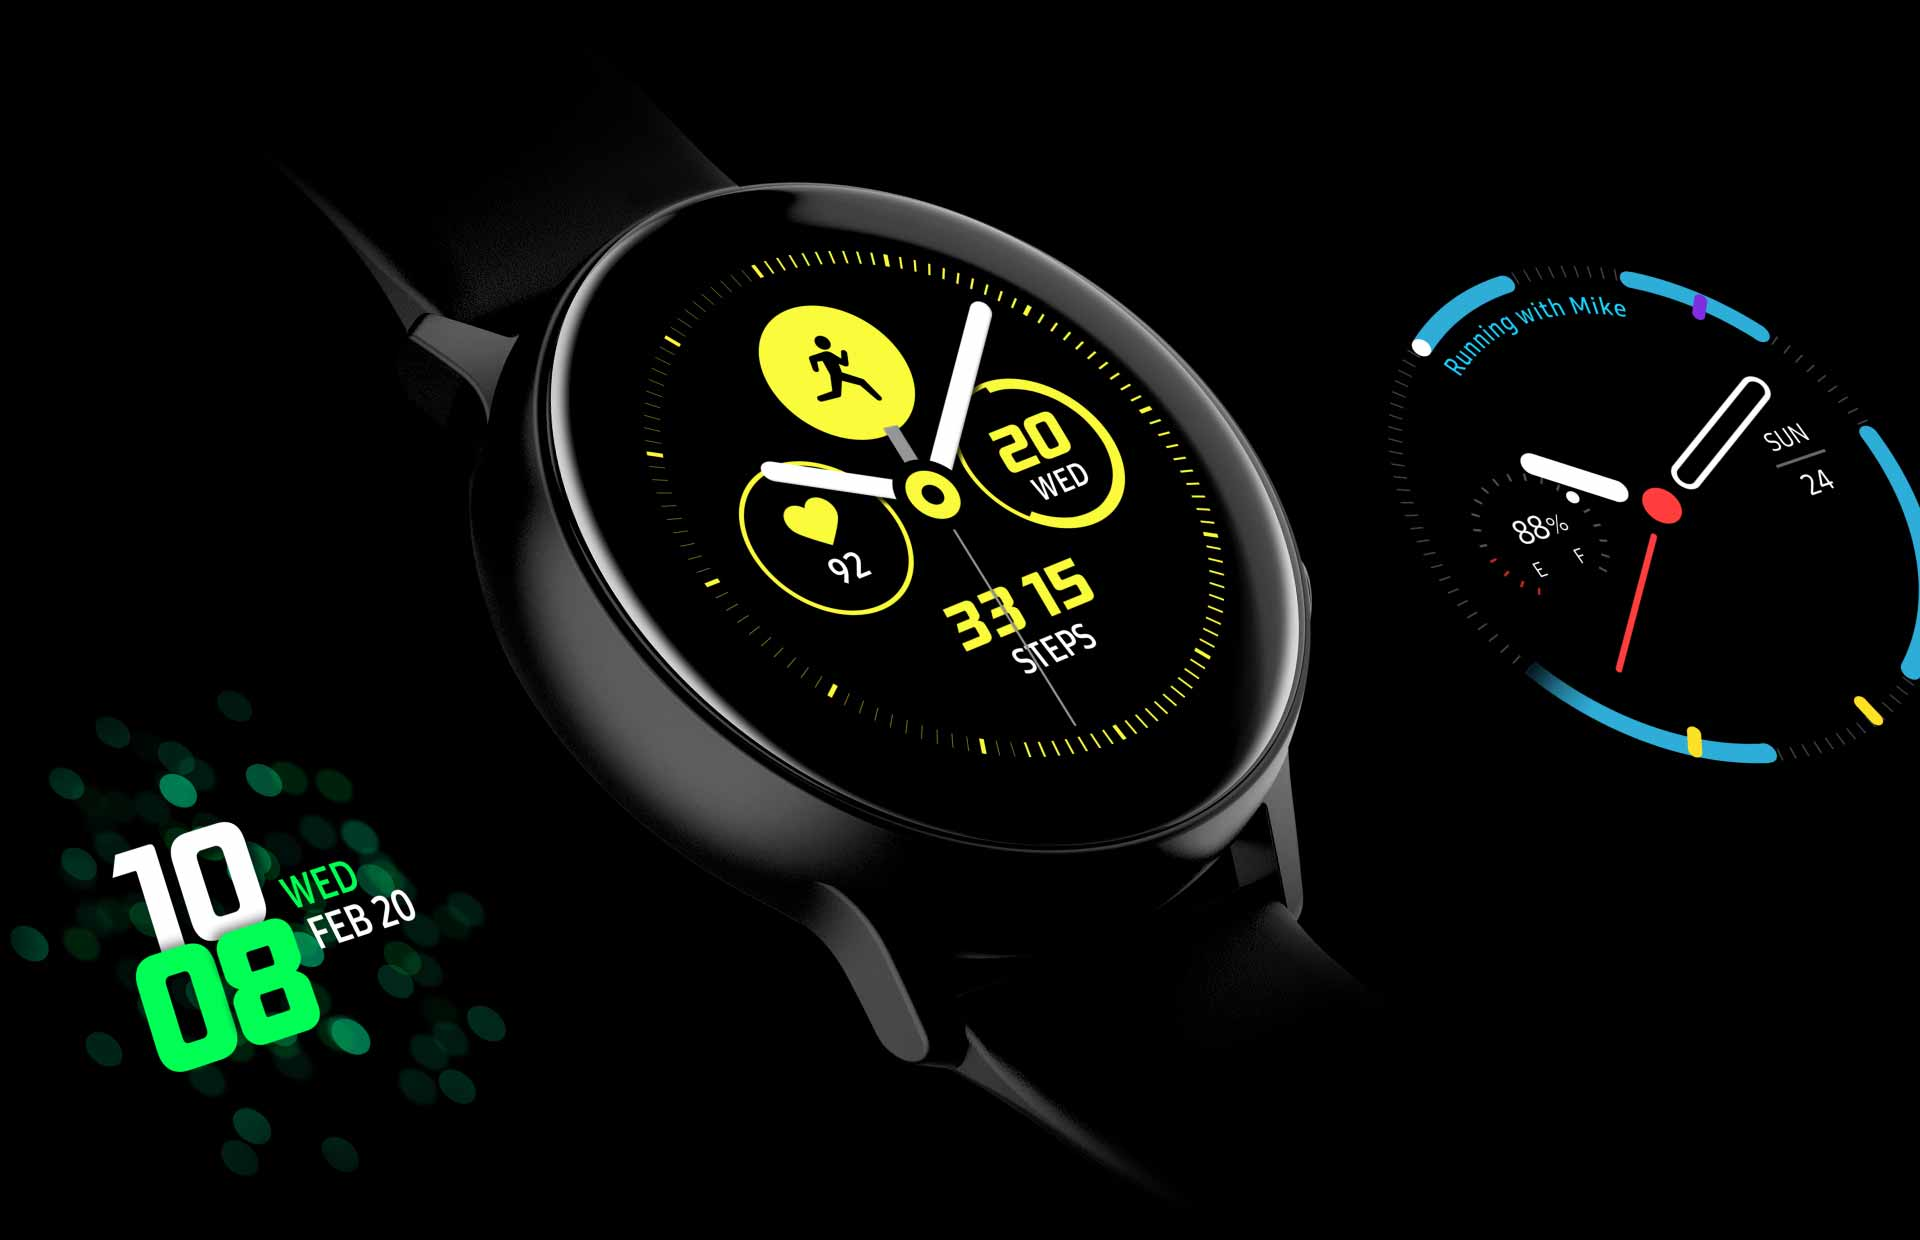 Лучшие циферблаты для Samsung Galaxy Watch Gear S2 S3